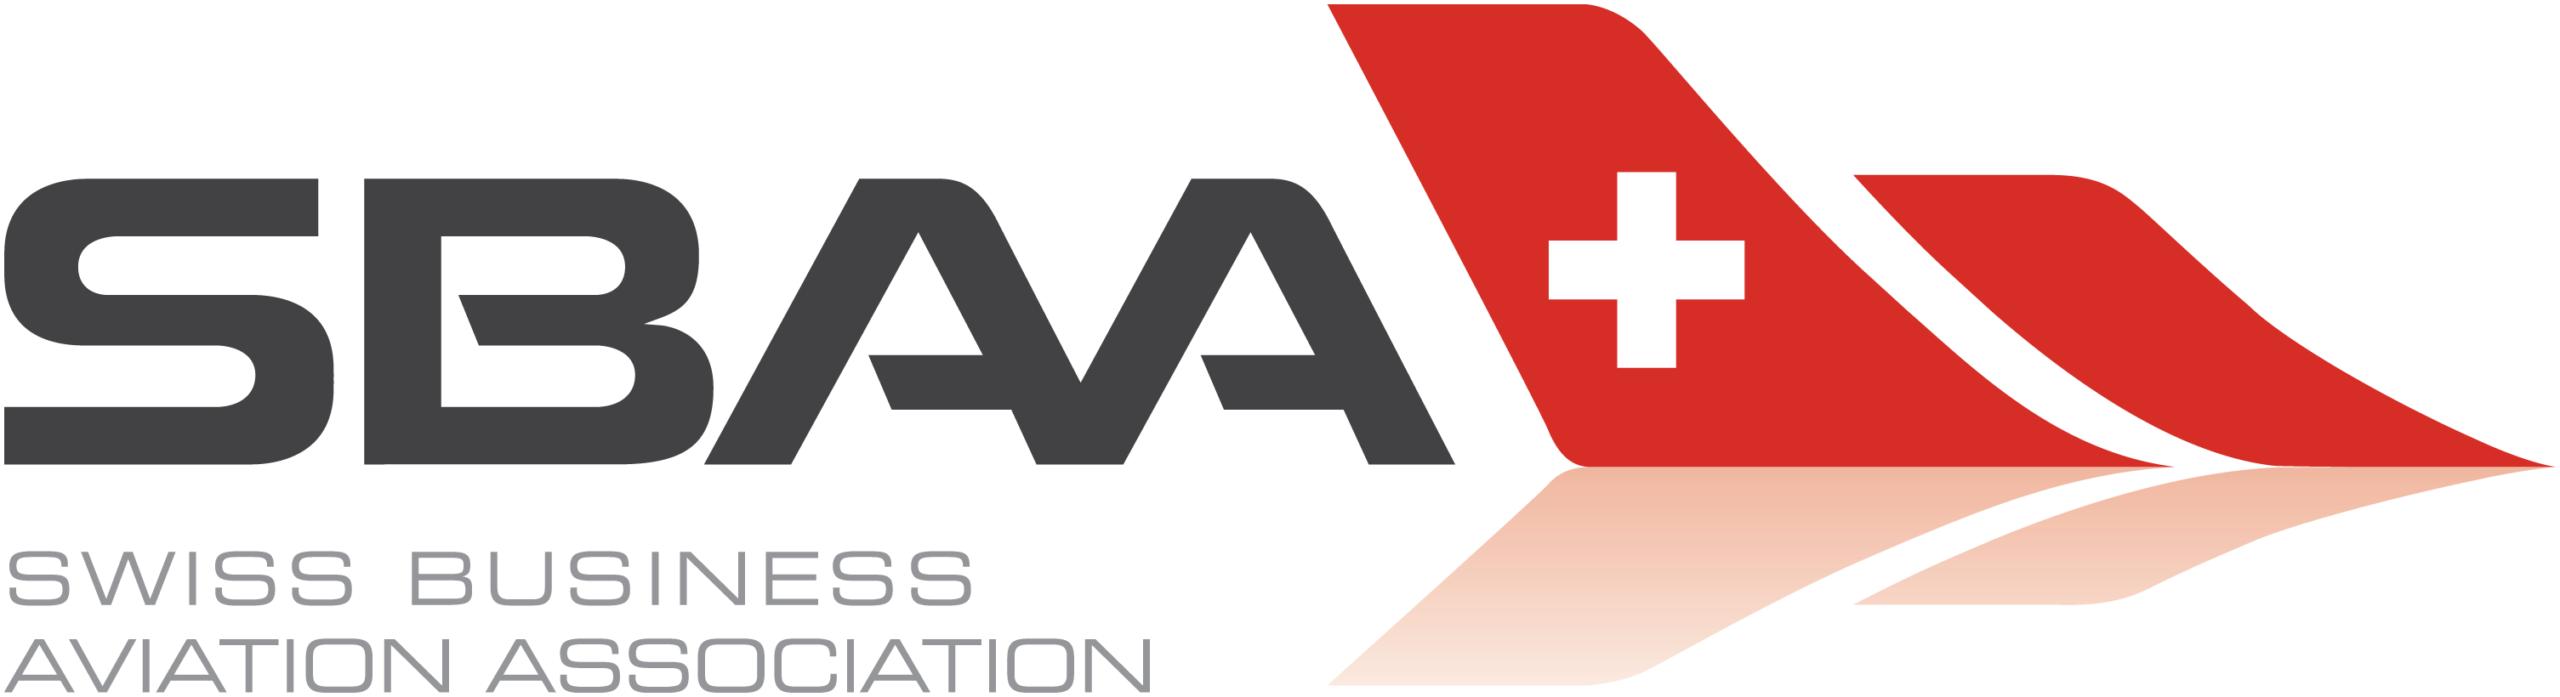 SBAA_logo_rgb_REFLECTION (003) logo